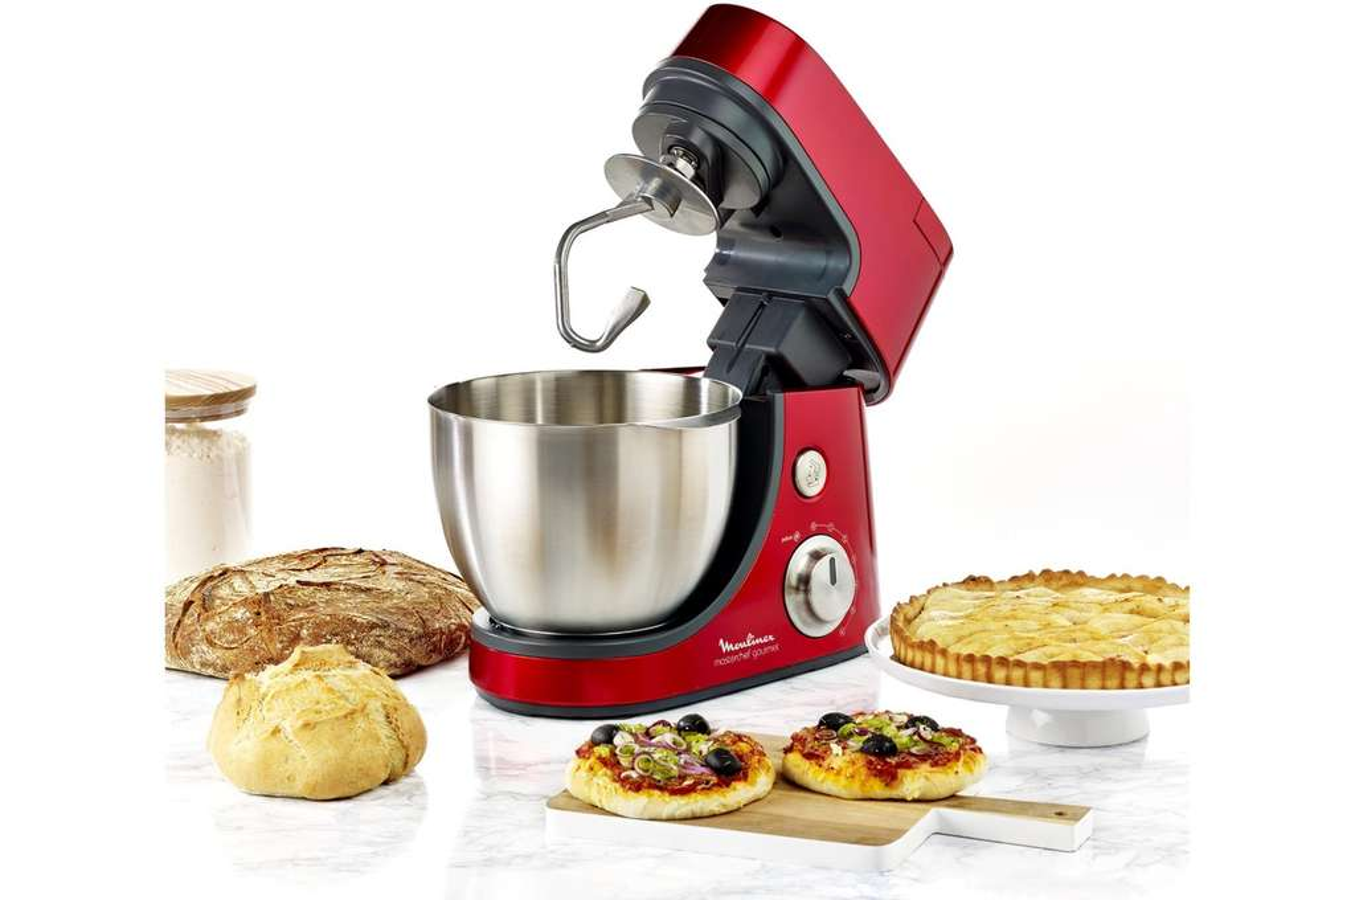 Robot p tissier moulinex masterchef gourmet qa506gb1 - Livre recette robot patissier ...